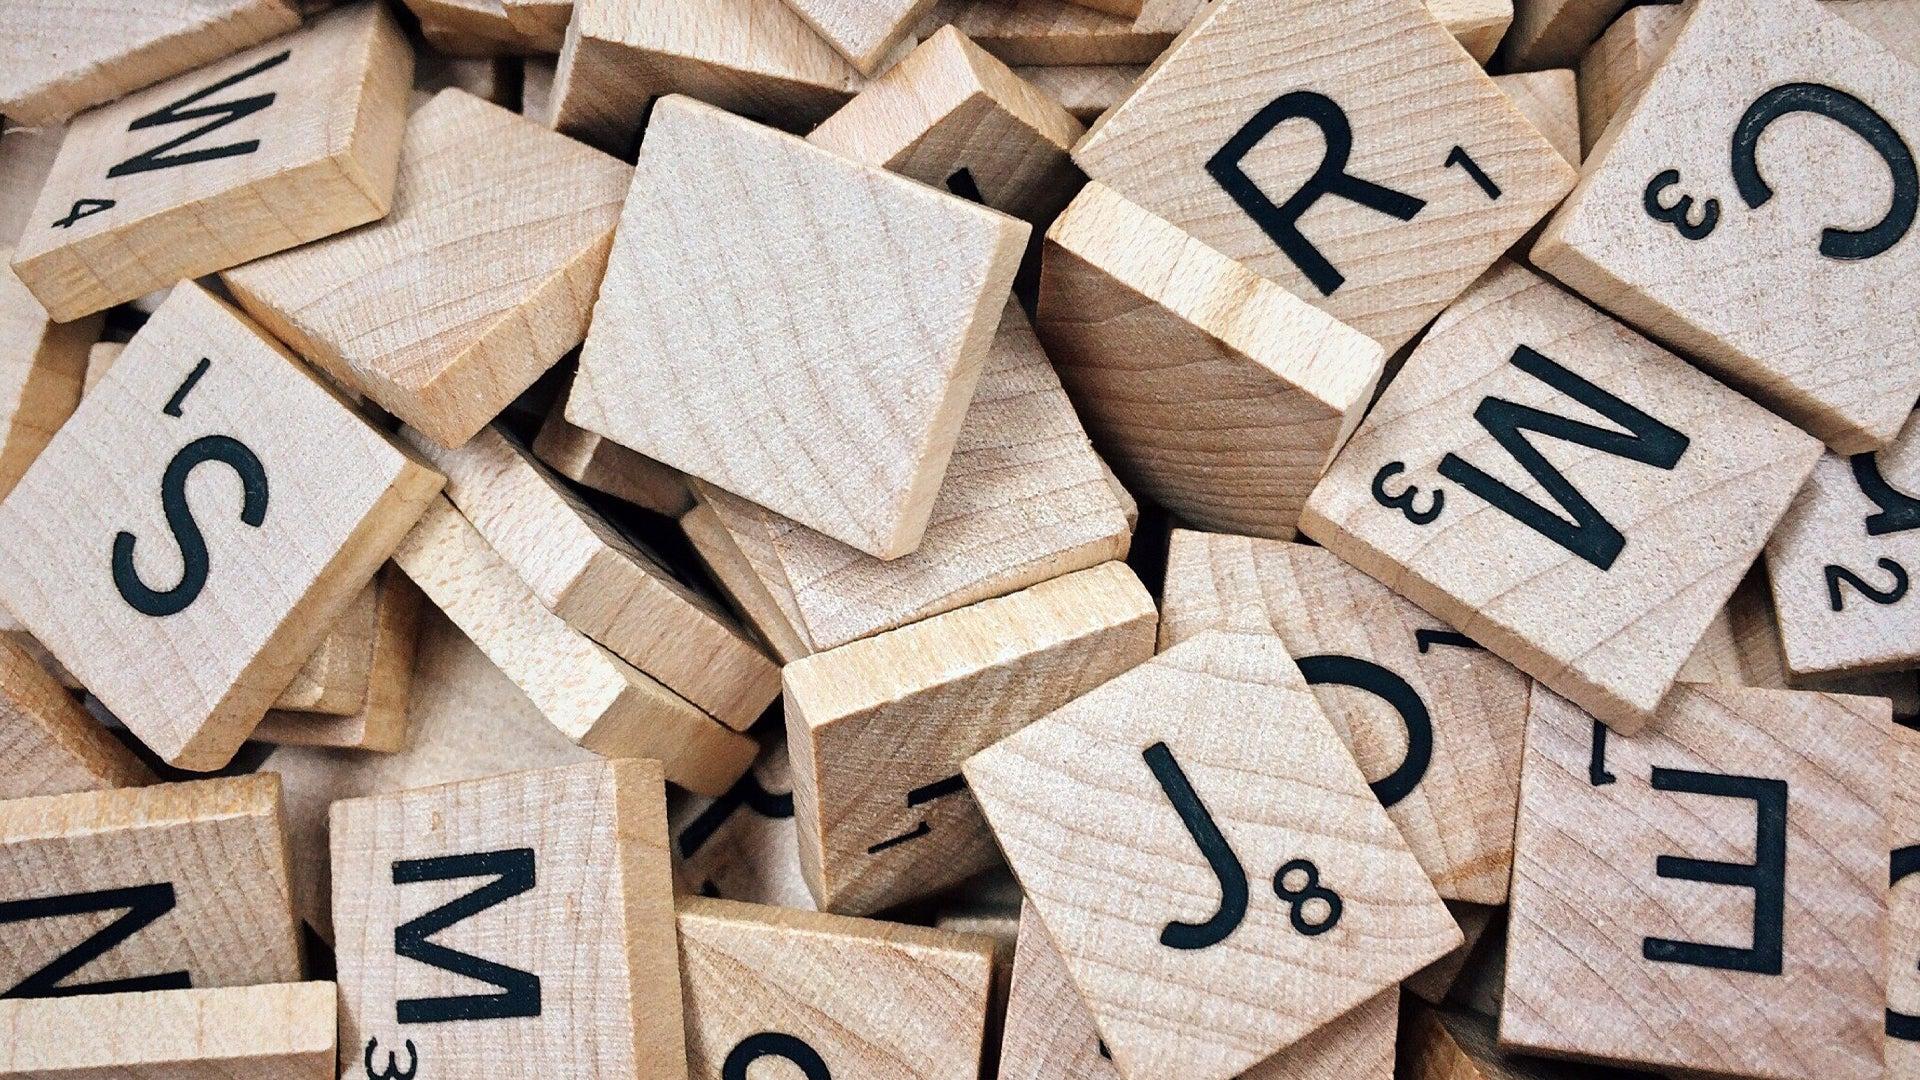 Scrabble board game tiles.